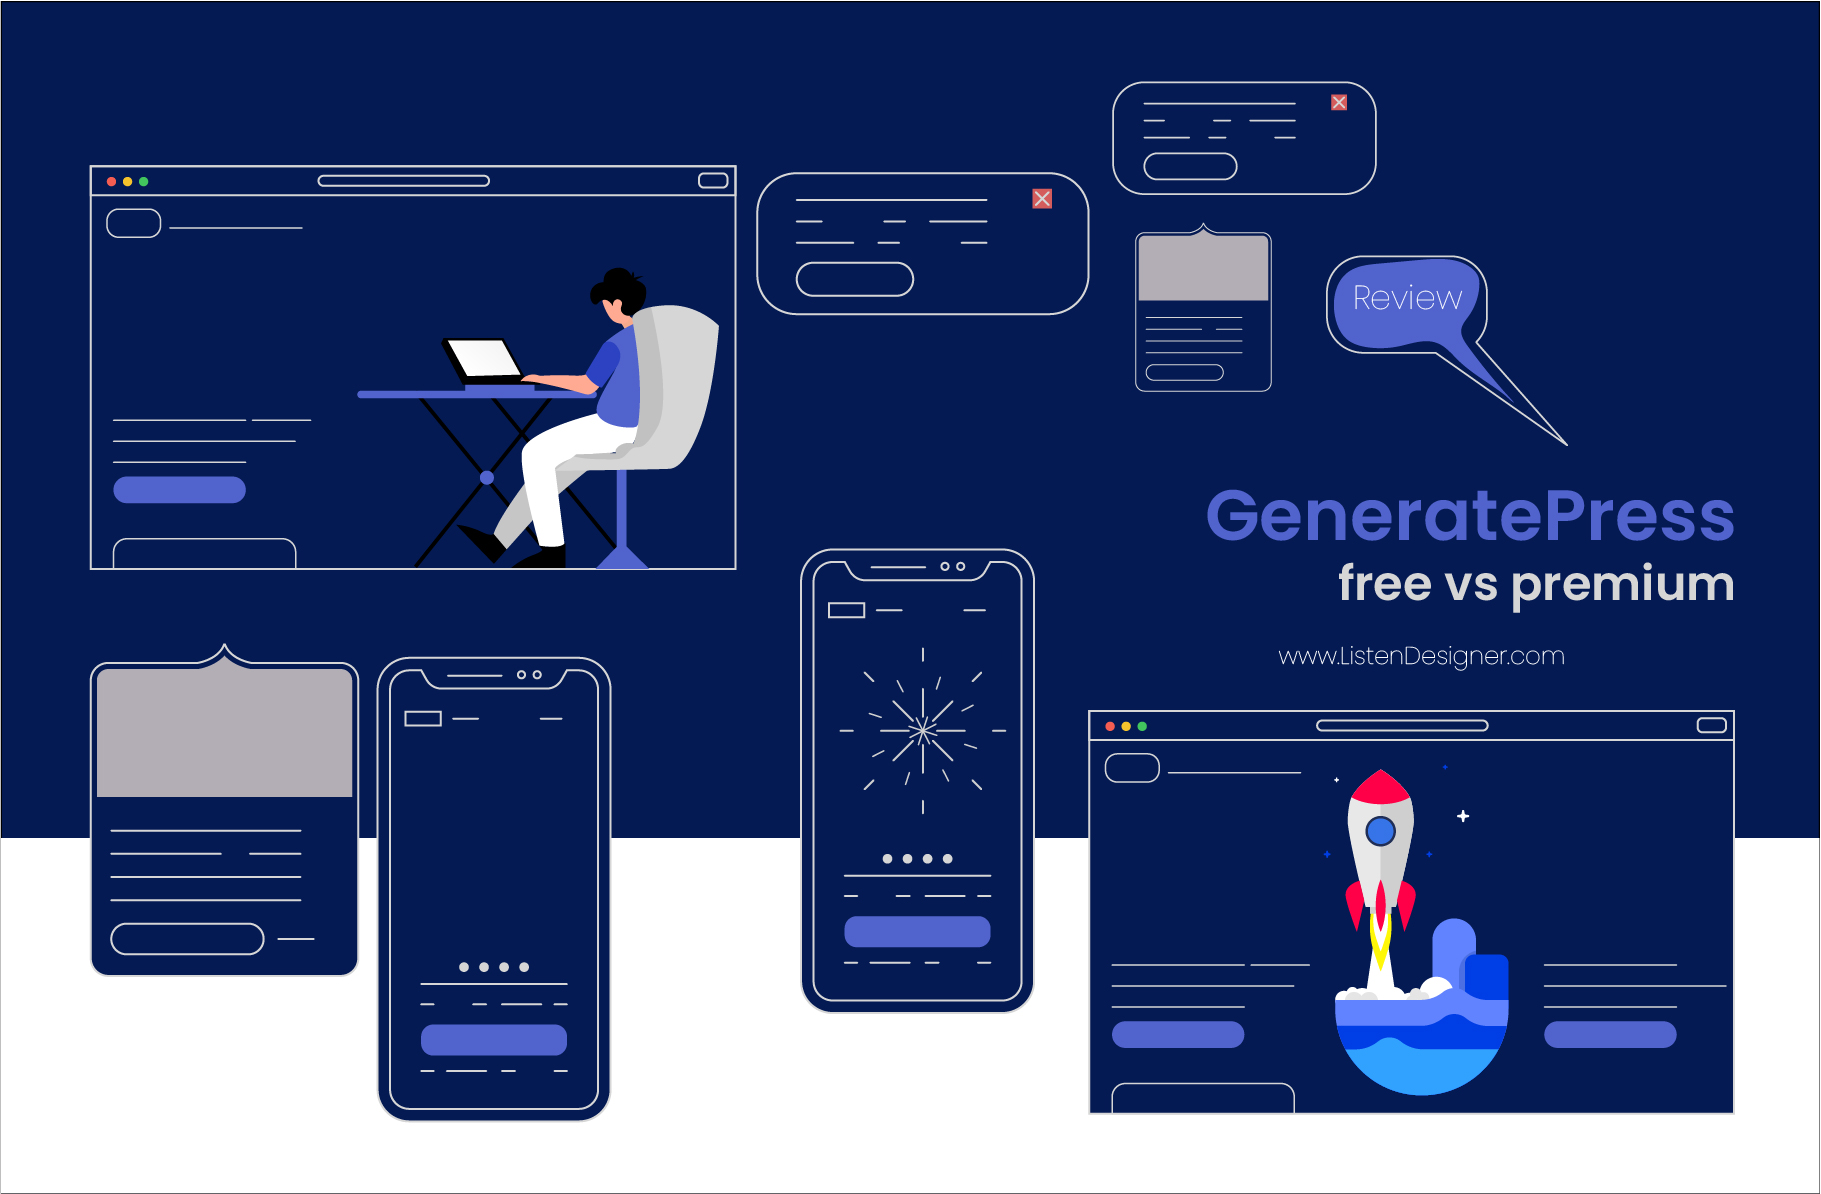 generatepress review free vs premium feature image